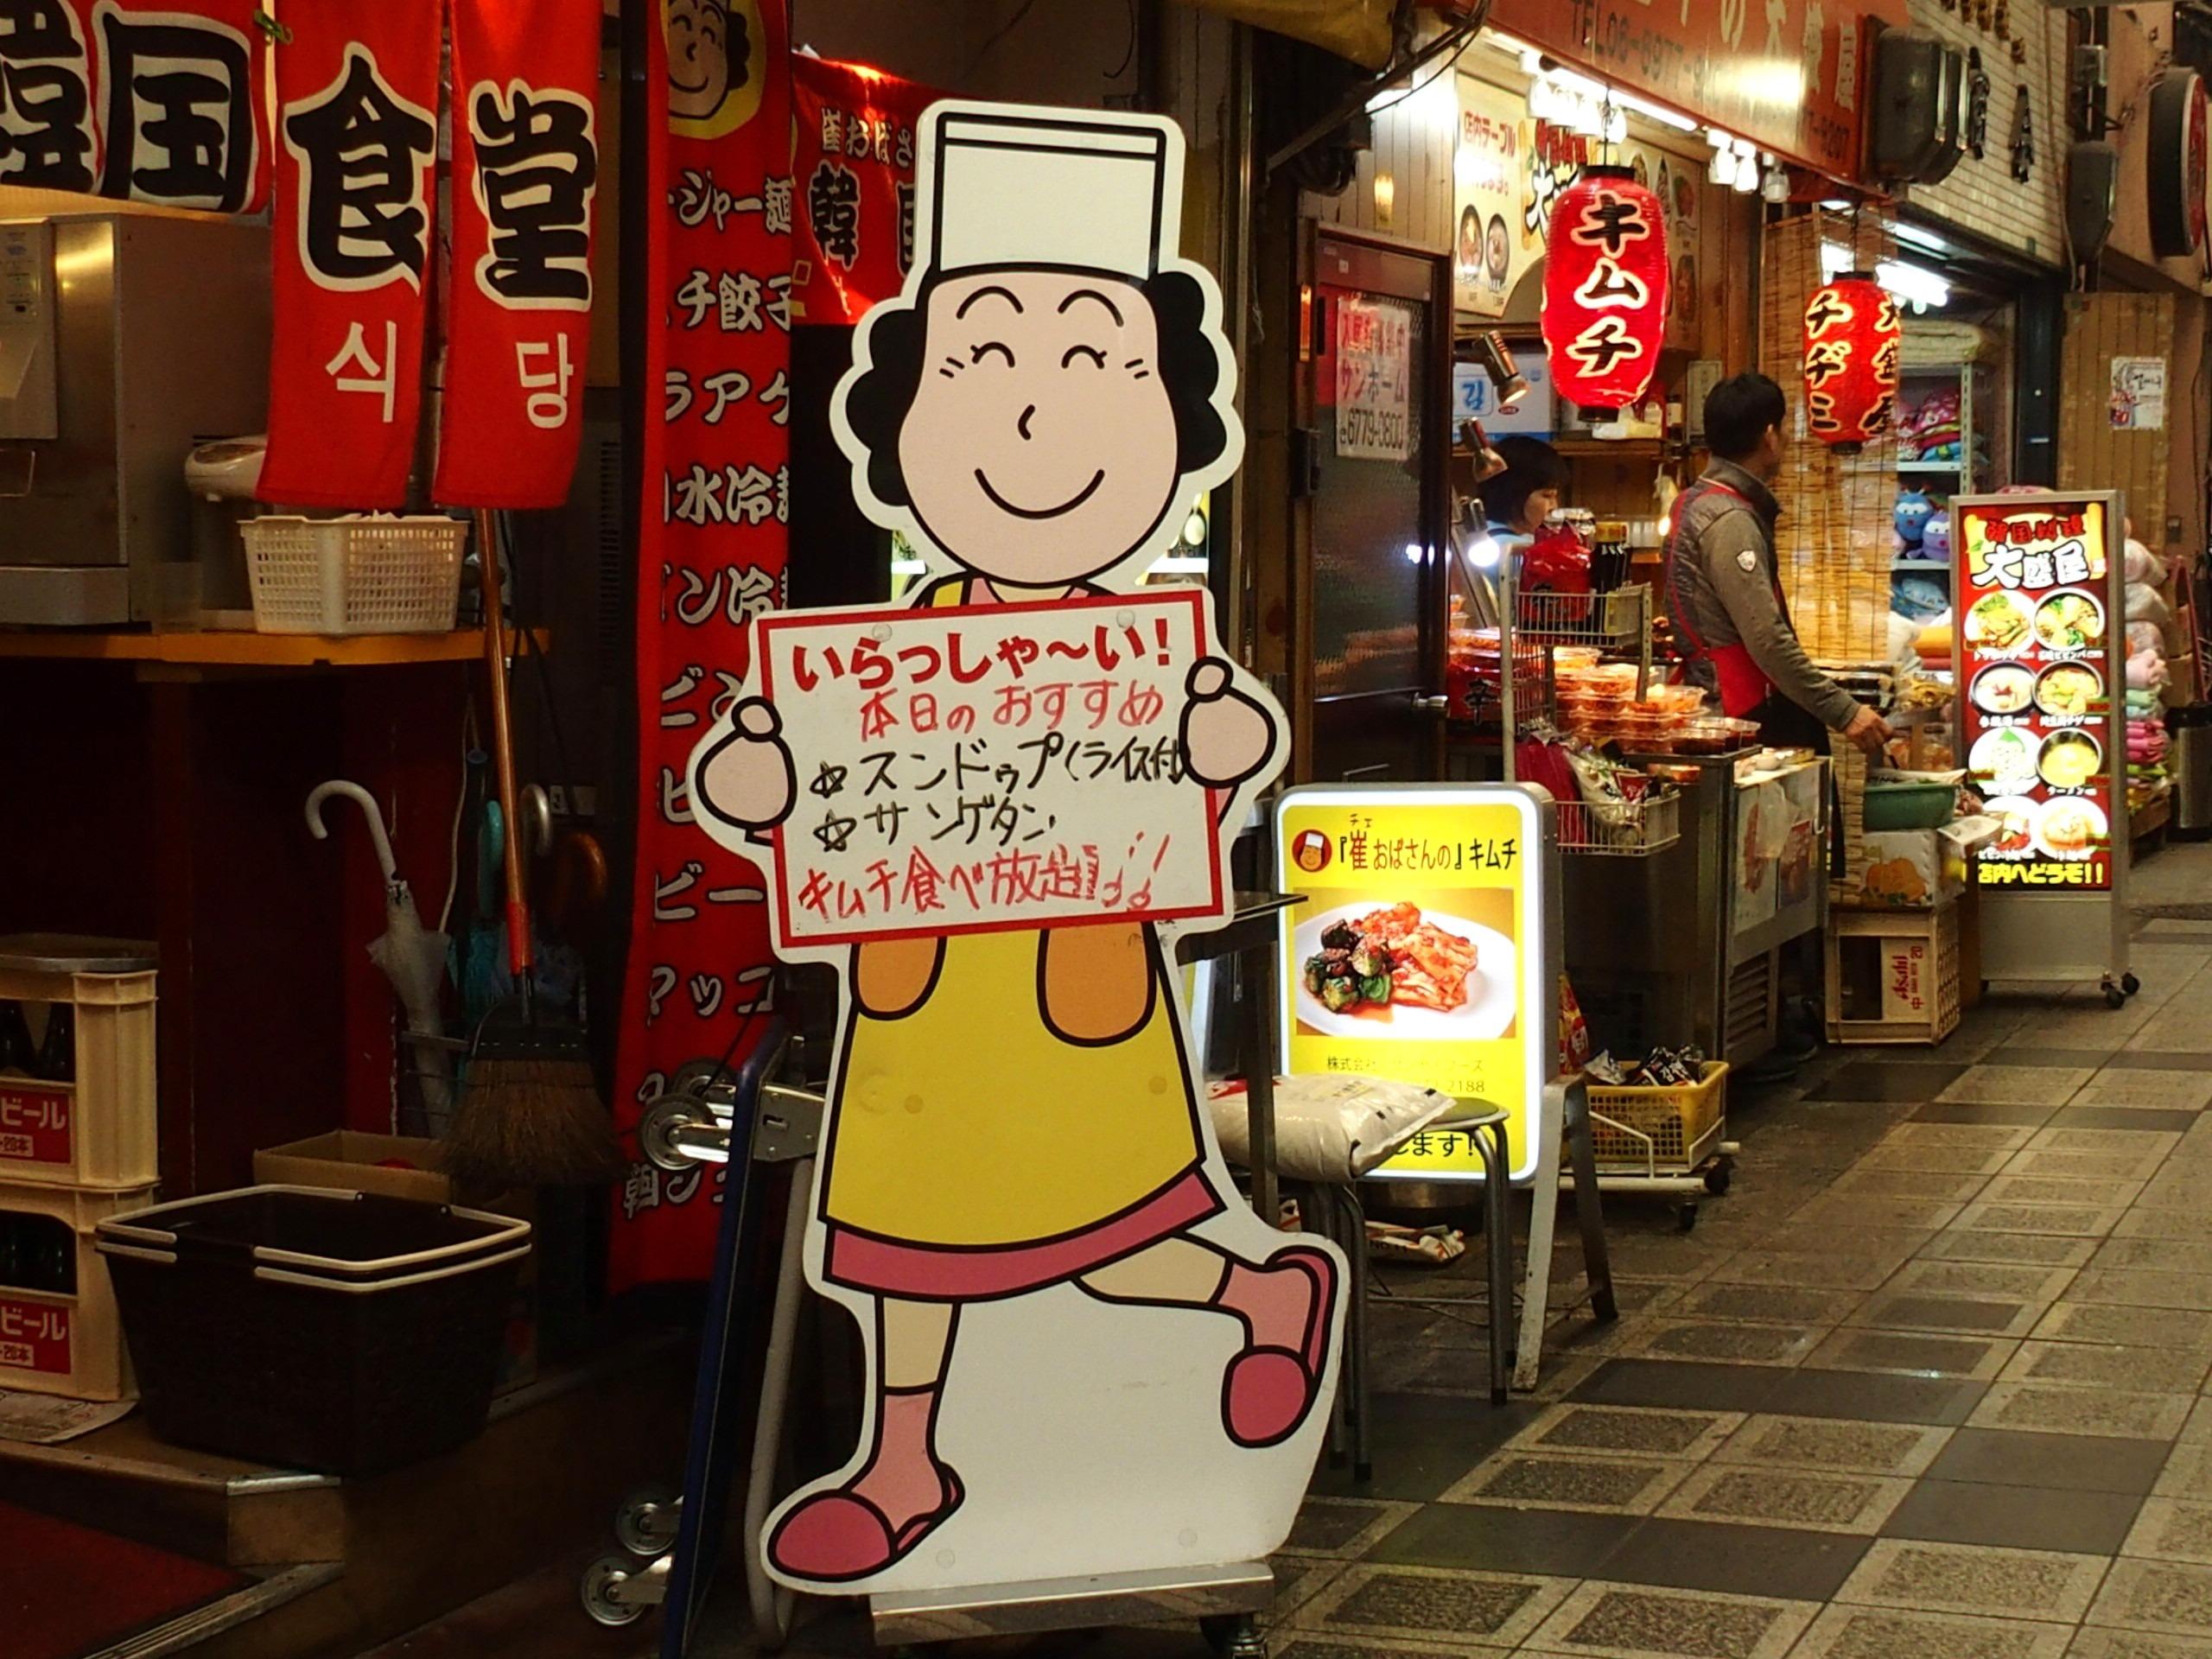 Enseigne restaurant visite d'Osaka Japon